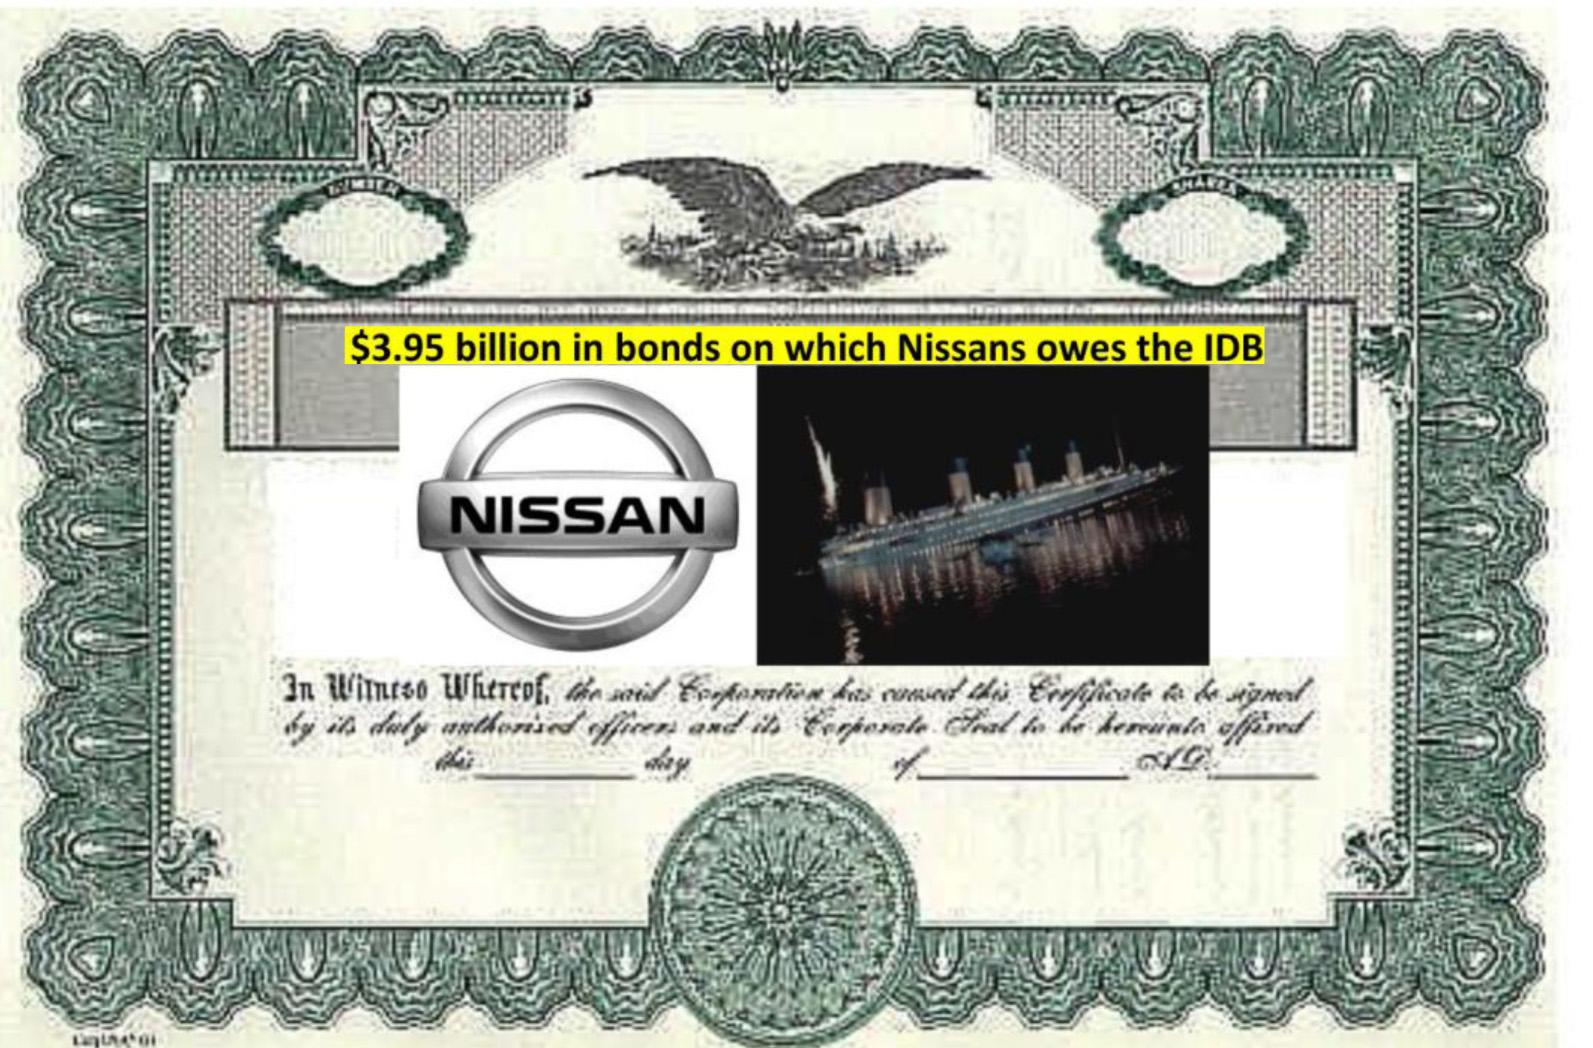 Roman Abramovich and his Crazy US 15 billion Yacht